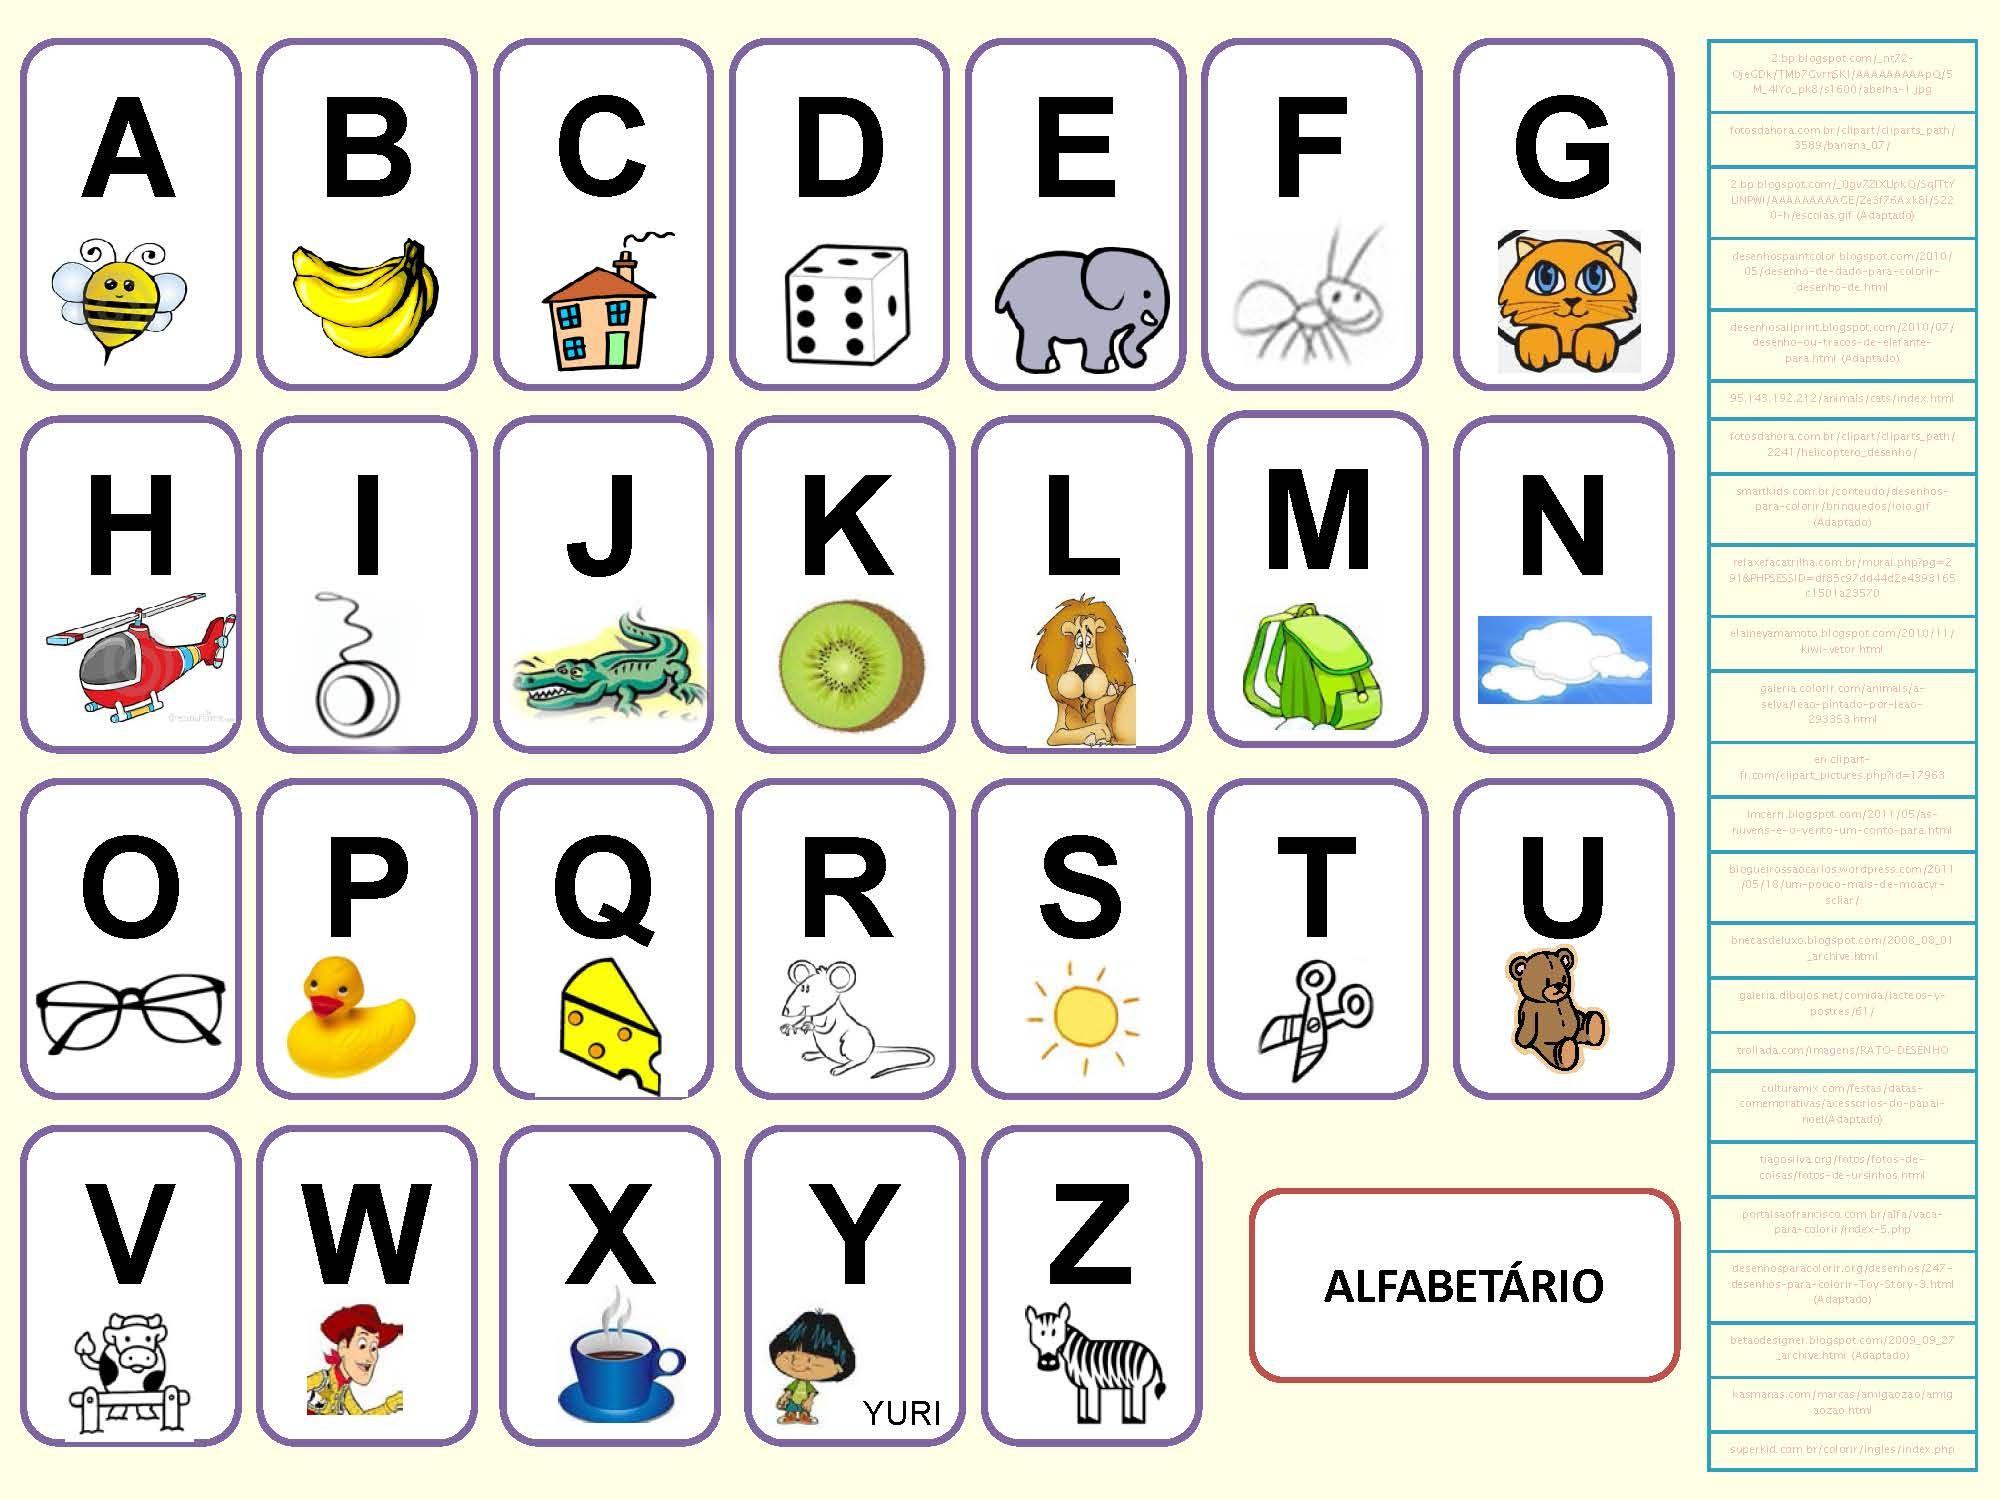 Apprendre Alphabet Maternelle Imprimer Wp32 | Jornalagora pour Apprendre Les Lettres Maternelle